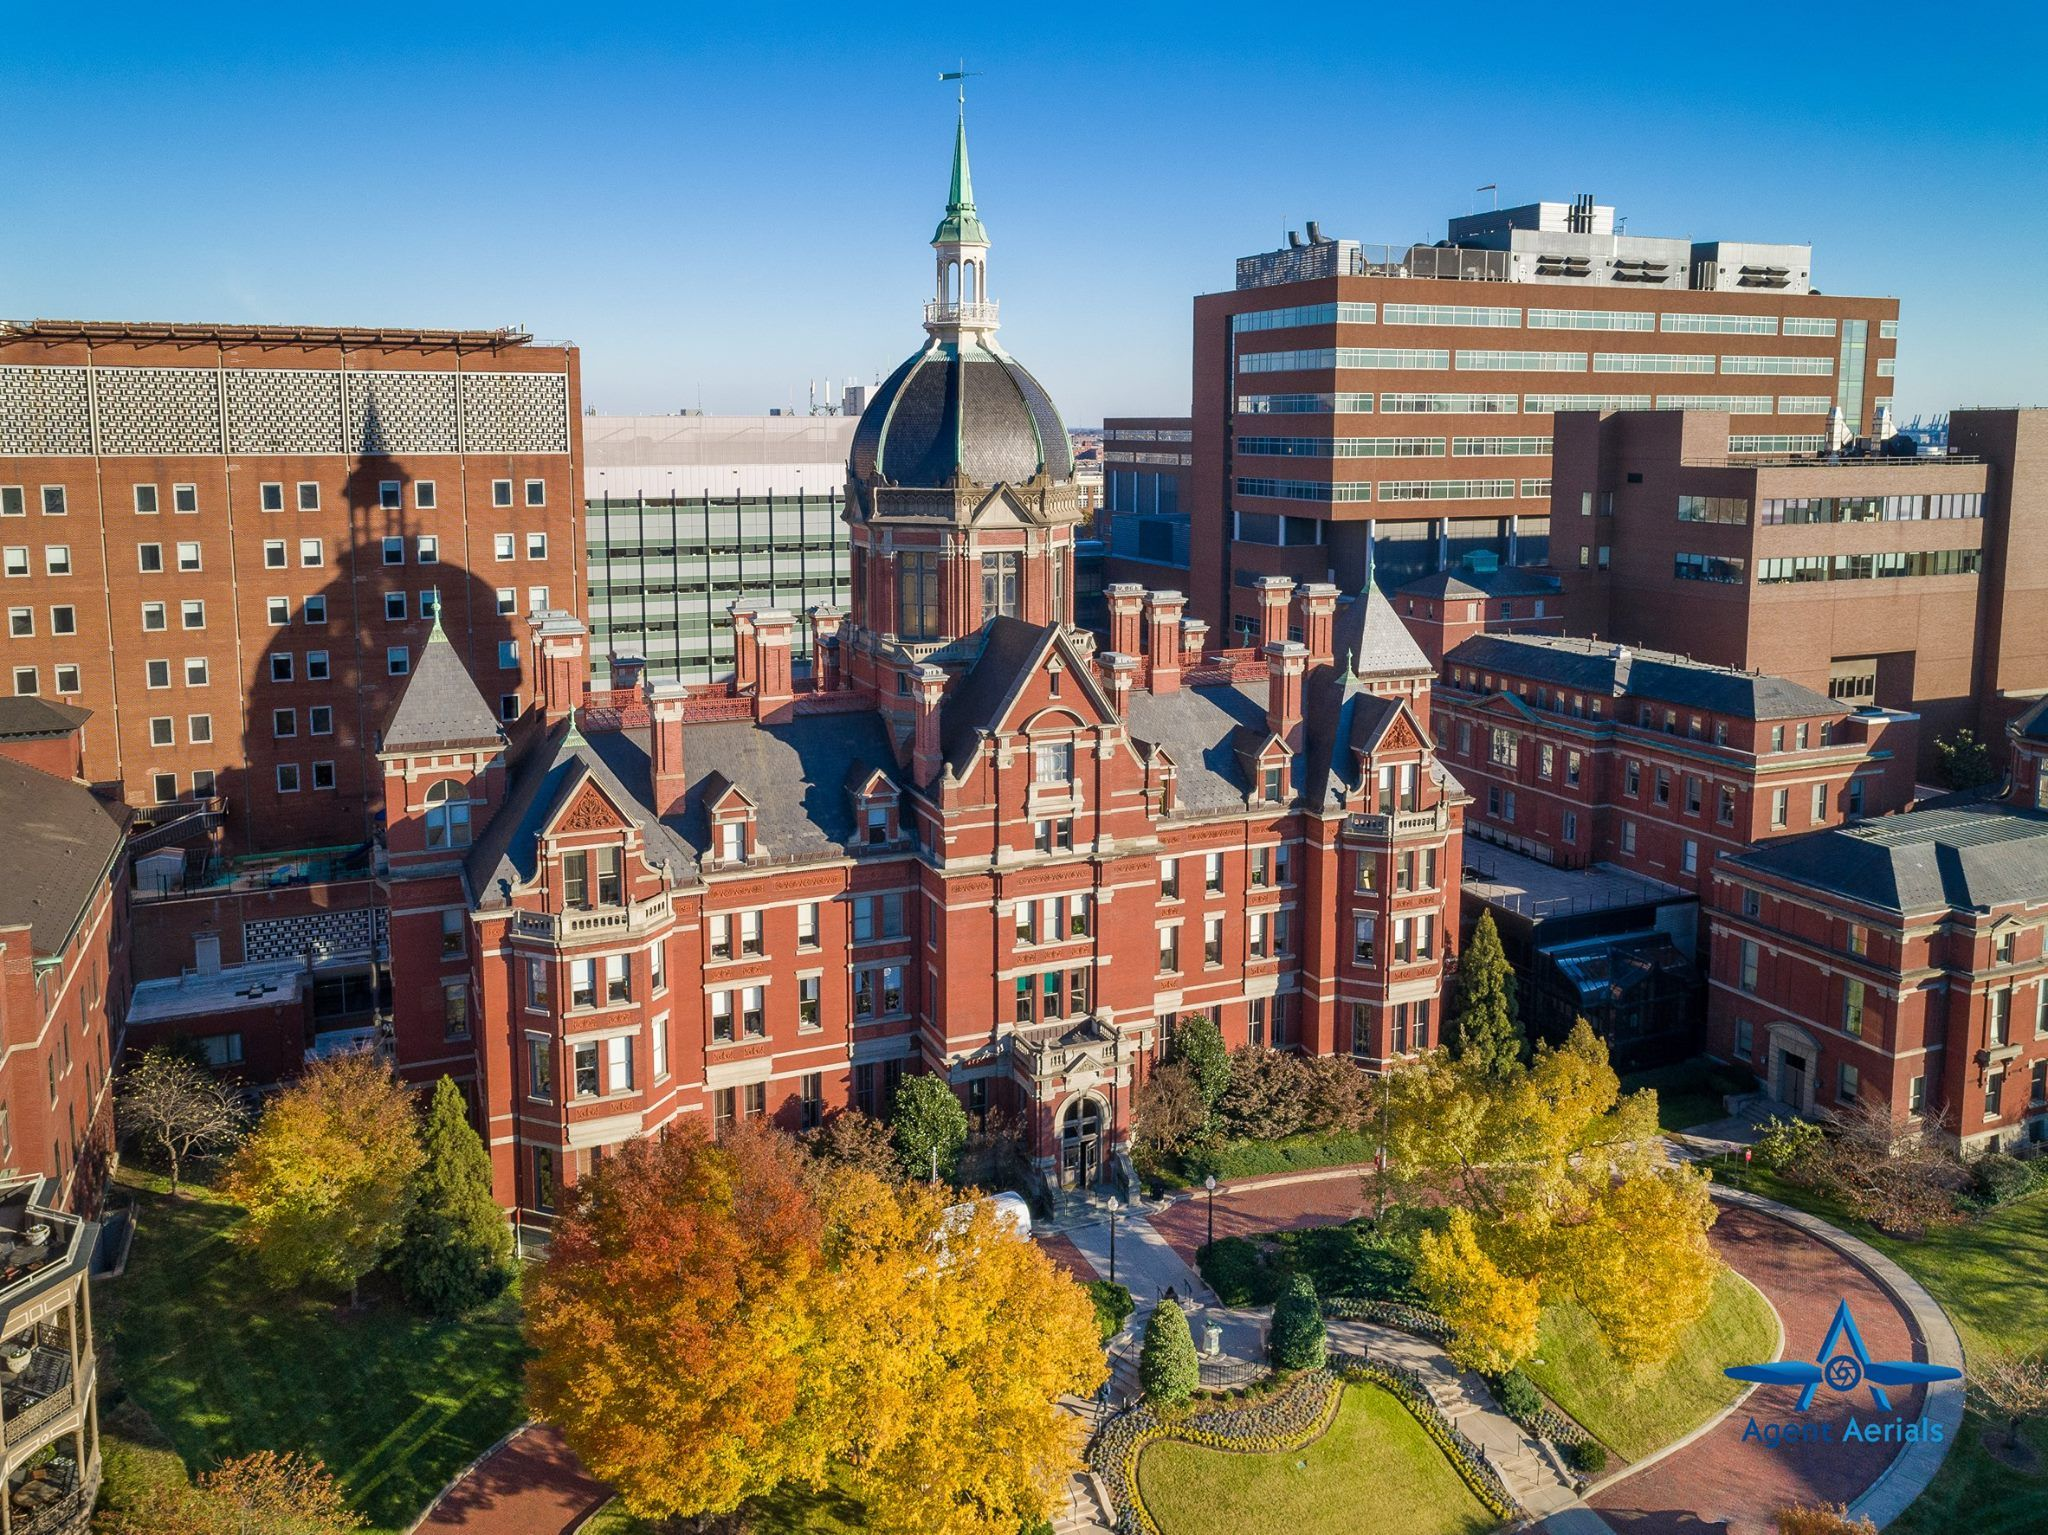 Baltimore Baltimore Maryland John Hopkins Hospital Dome Johns Hopkins Hospital University Campus Johns Hopkins University